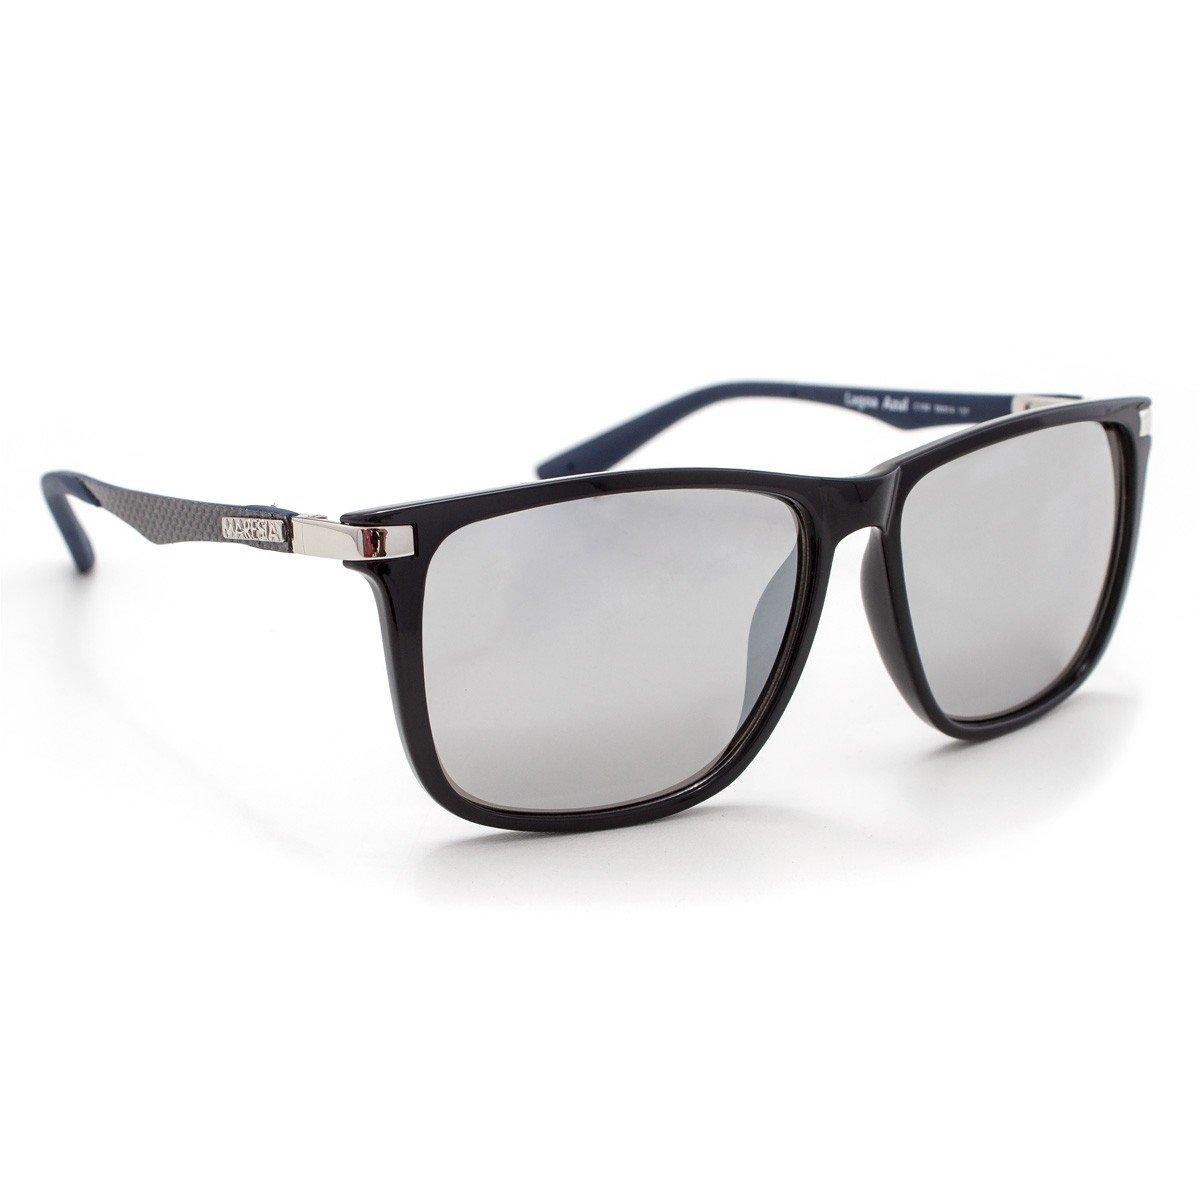 Óculos De Sol Maresia Lagoa Azul - Compre Agora   Netshoes 22da2d70a8